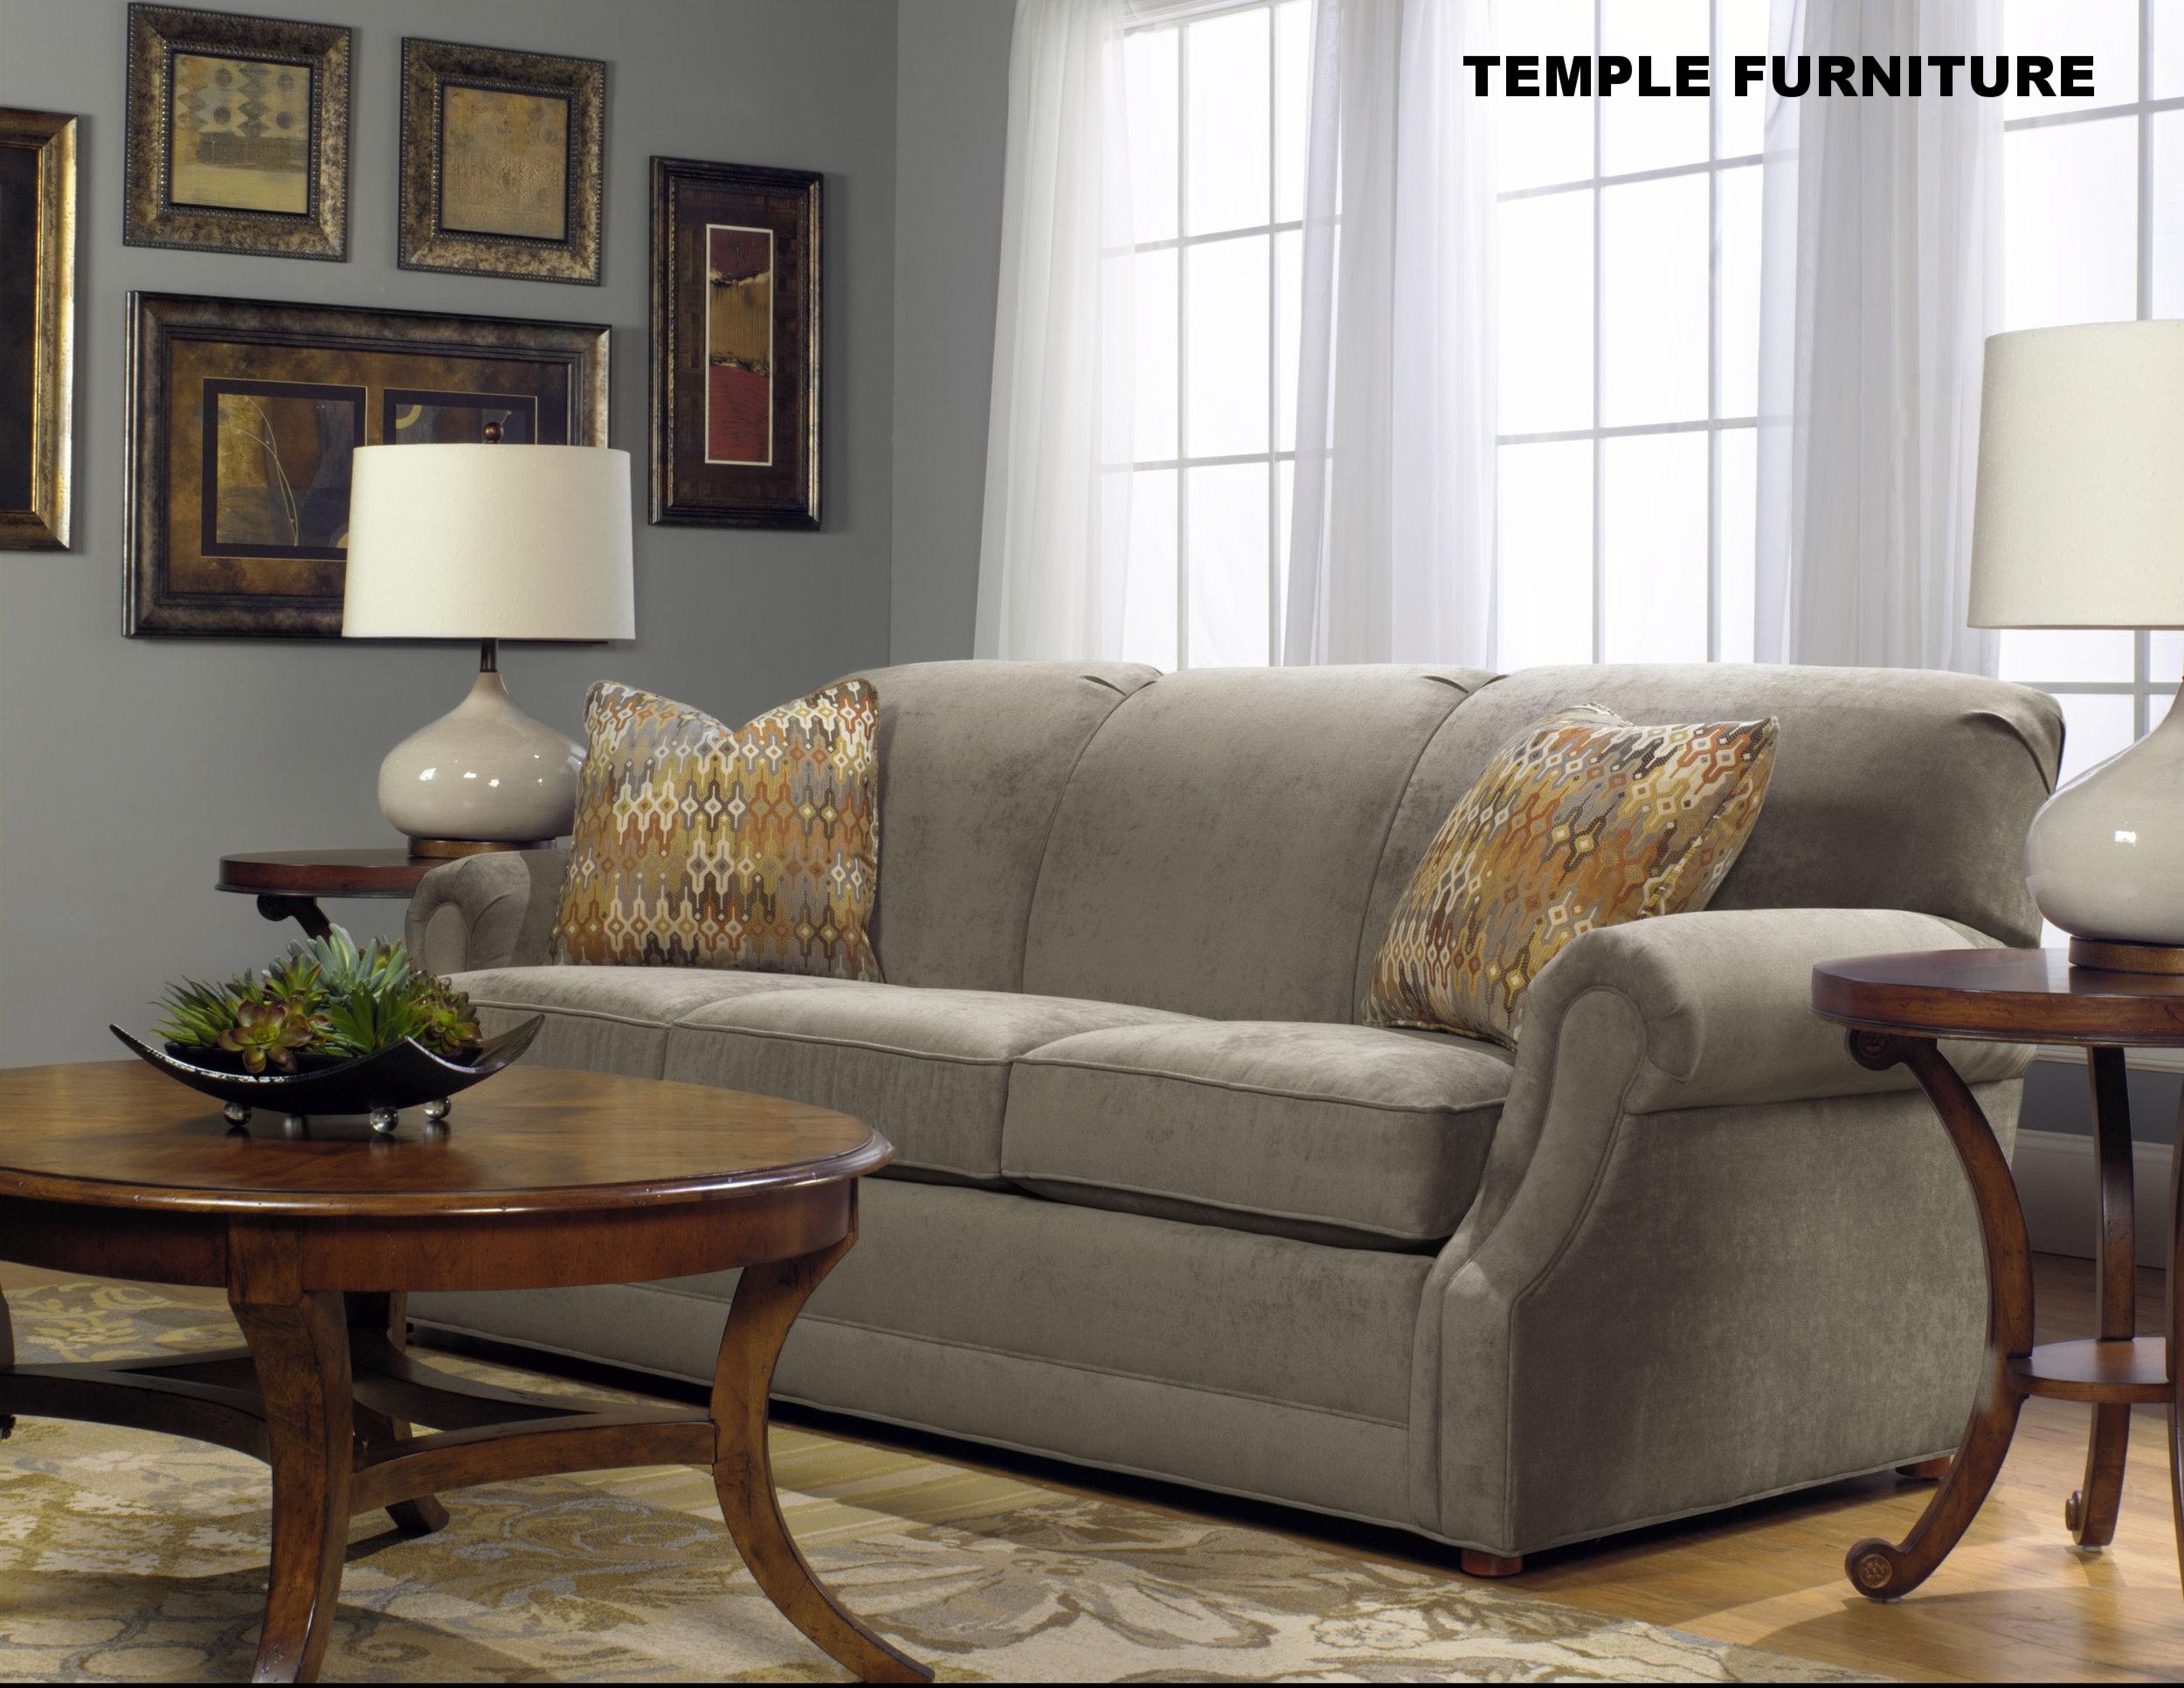 Temple Sofa.jpg